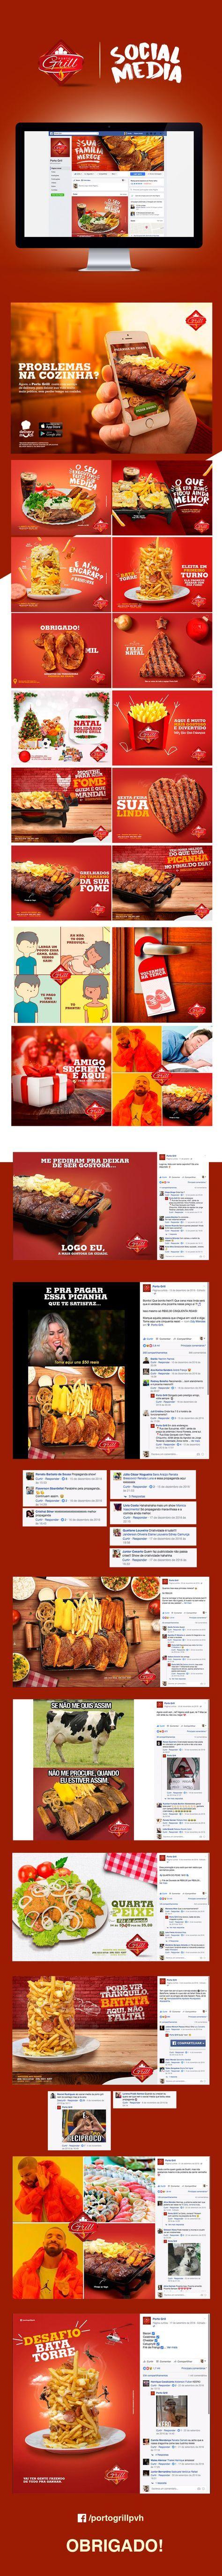 Porto Grill - Social Media on Behance